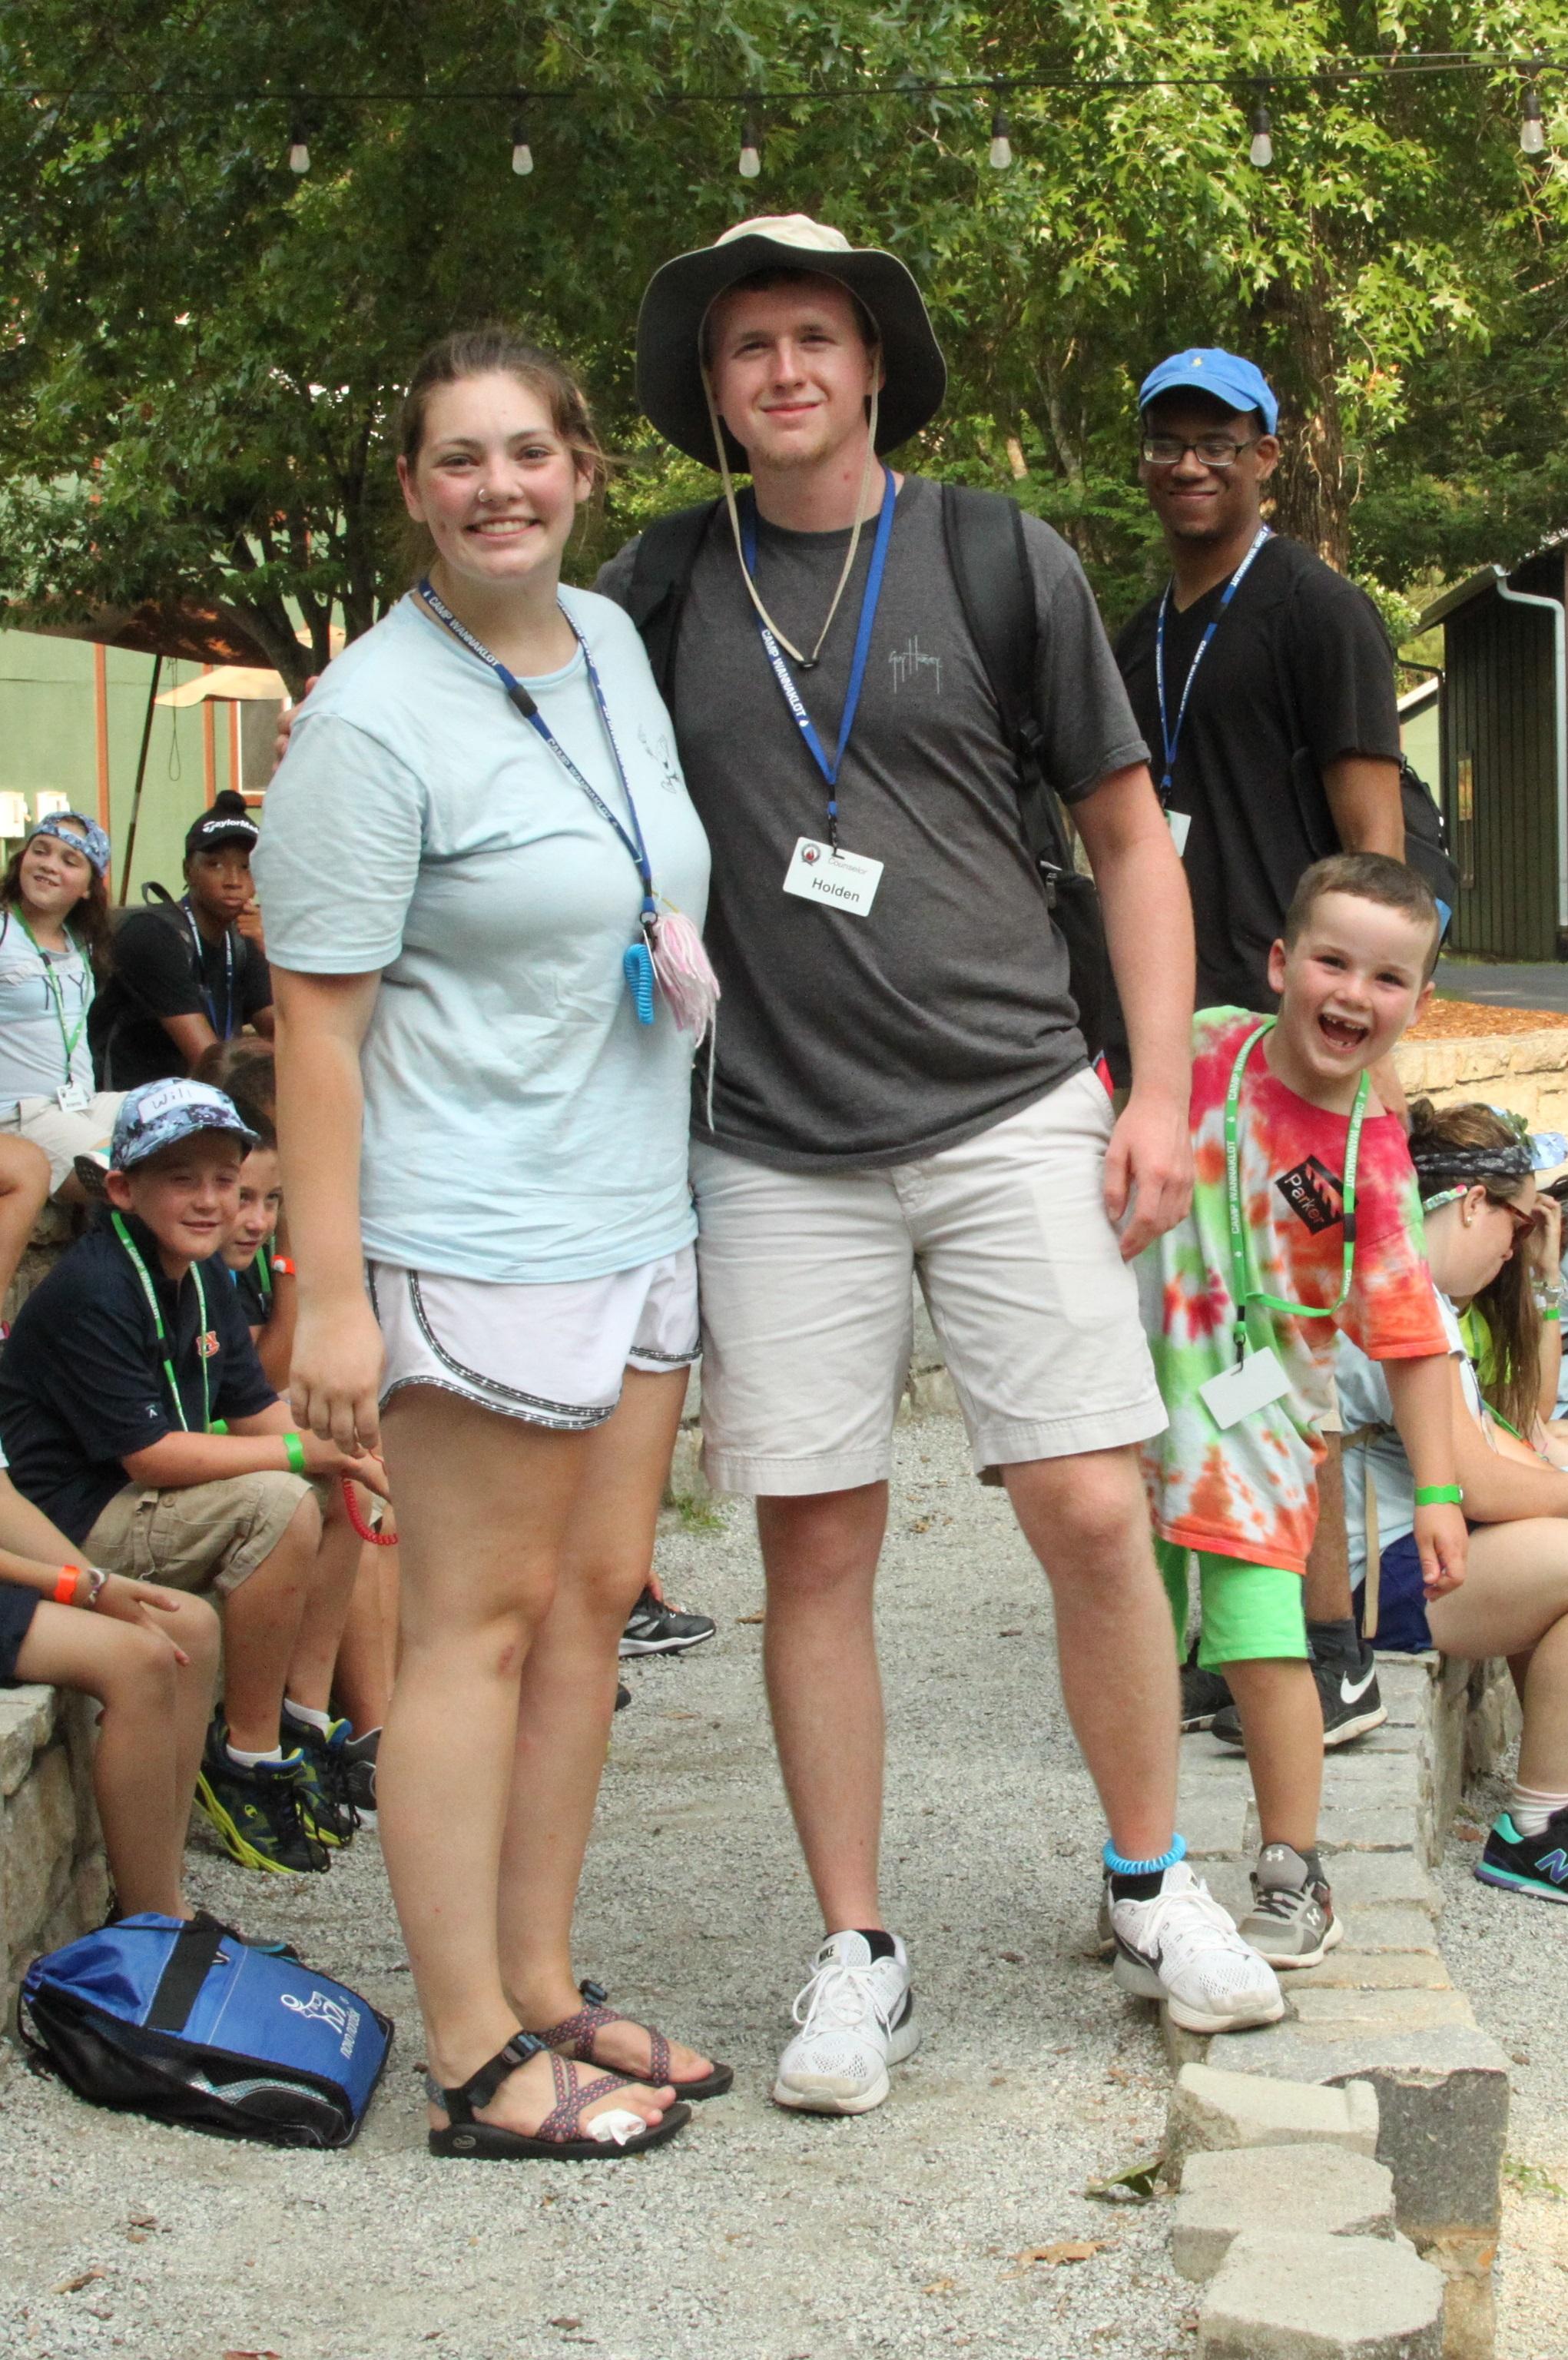 Volunteer for Camp Wannaklot4